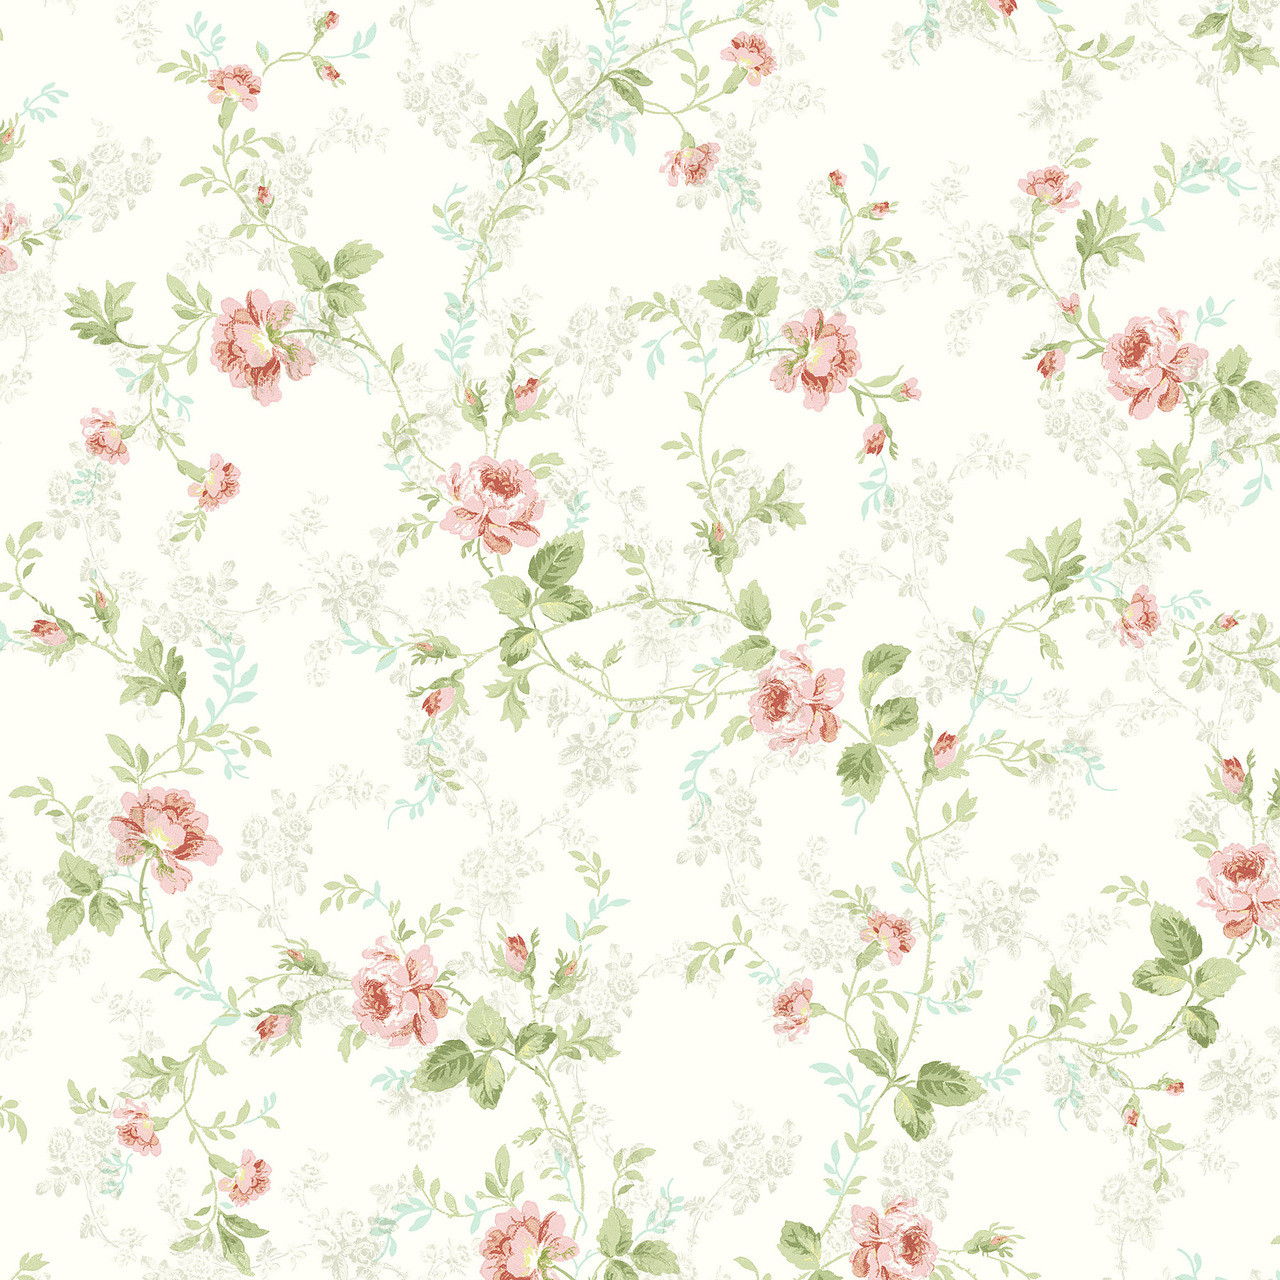 291 70603 Light Blue Mid Floral Trail Wallpaper Indoorwallpaper Com